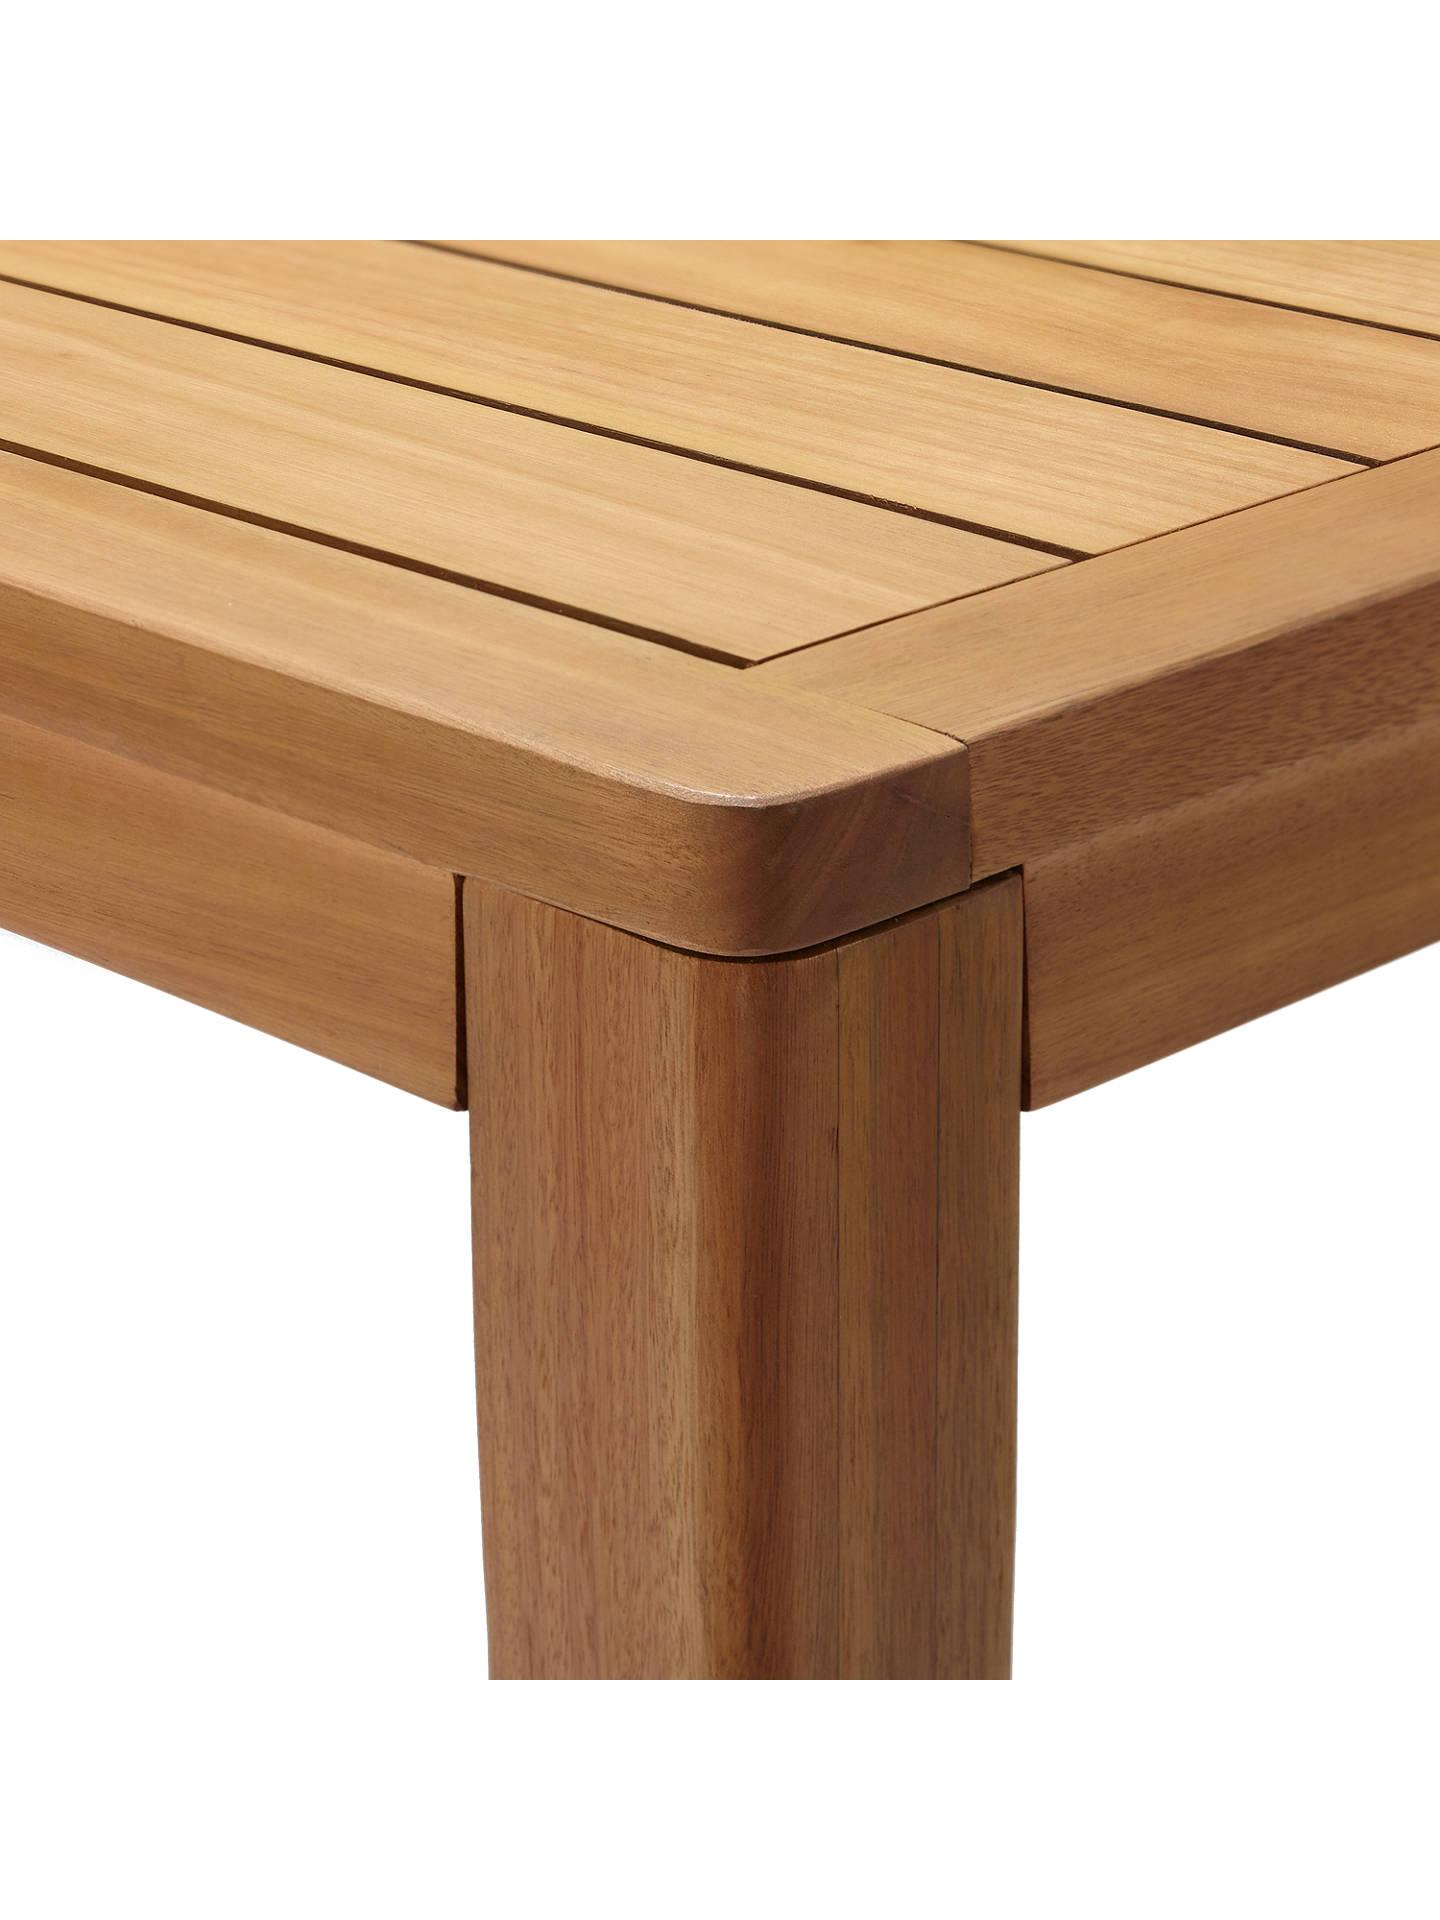 John Lewis Alta 6 Seat Garden Dining Table / Chairs Set, FSC ...